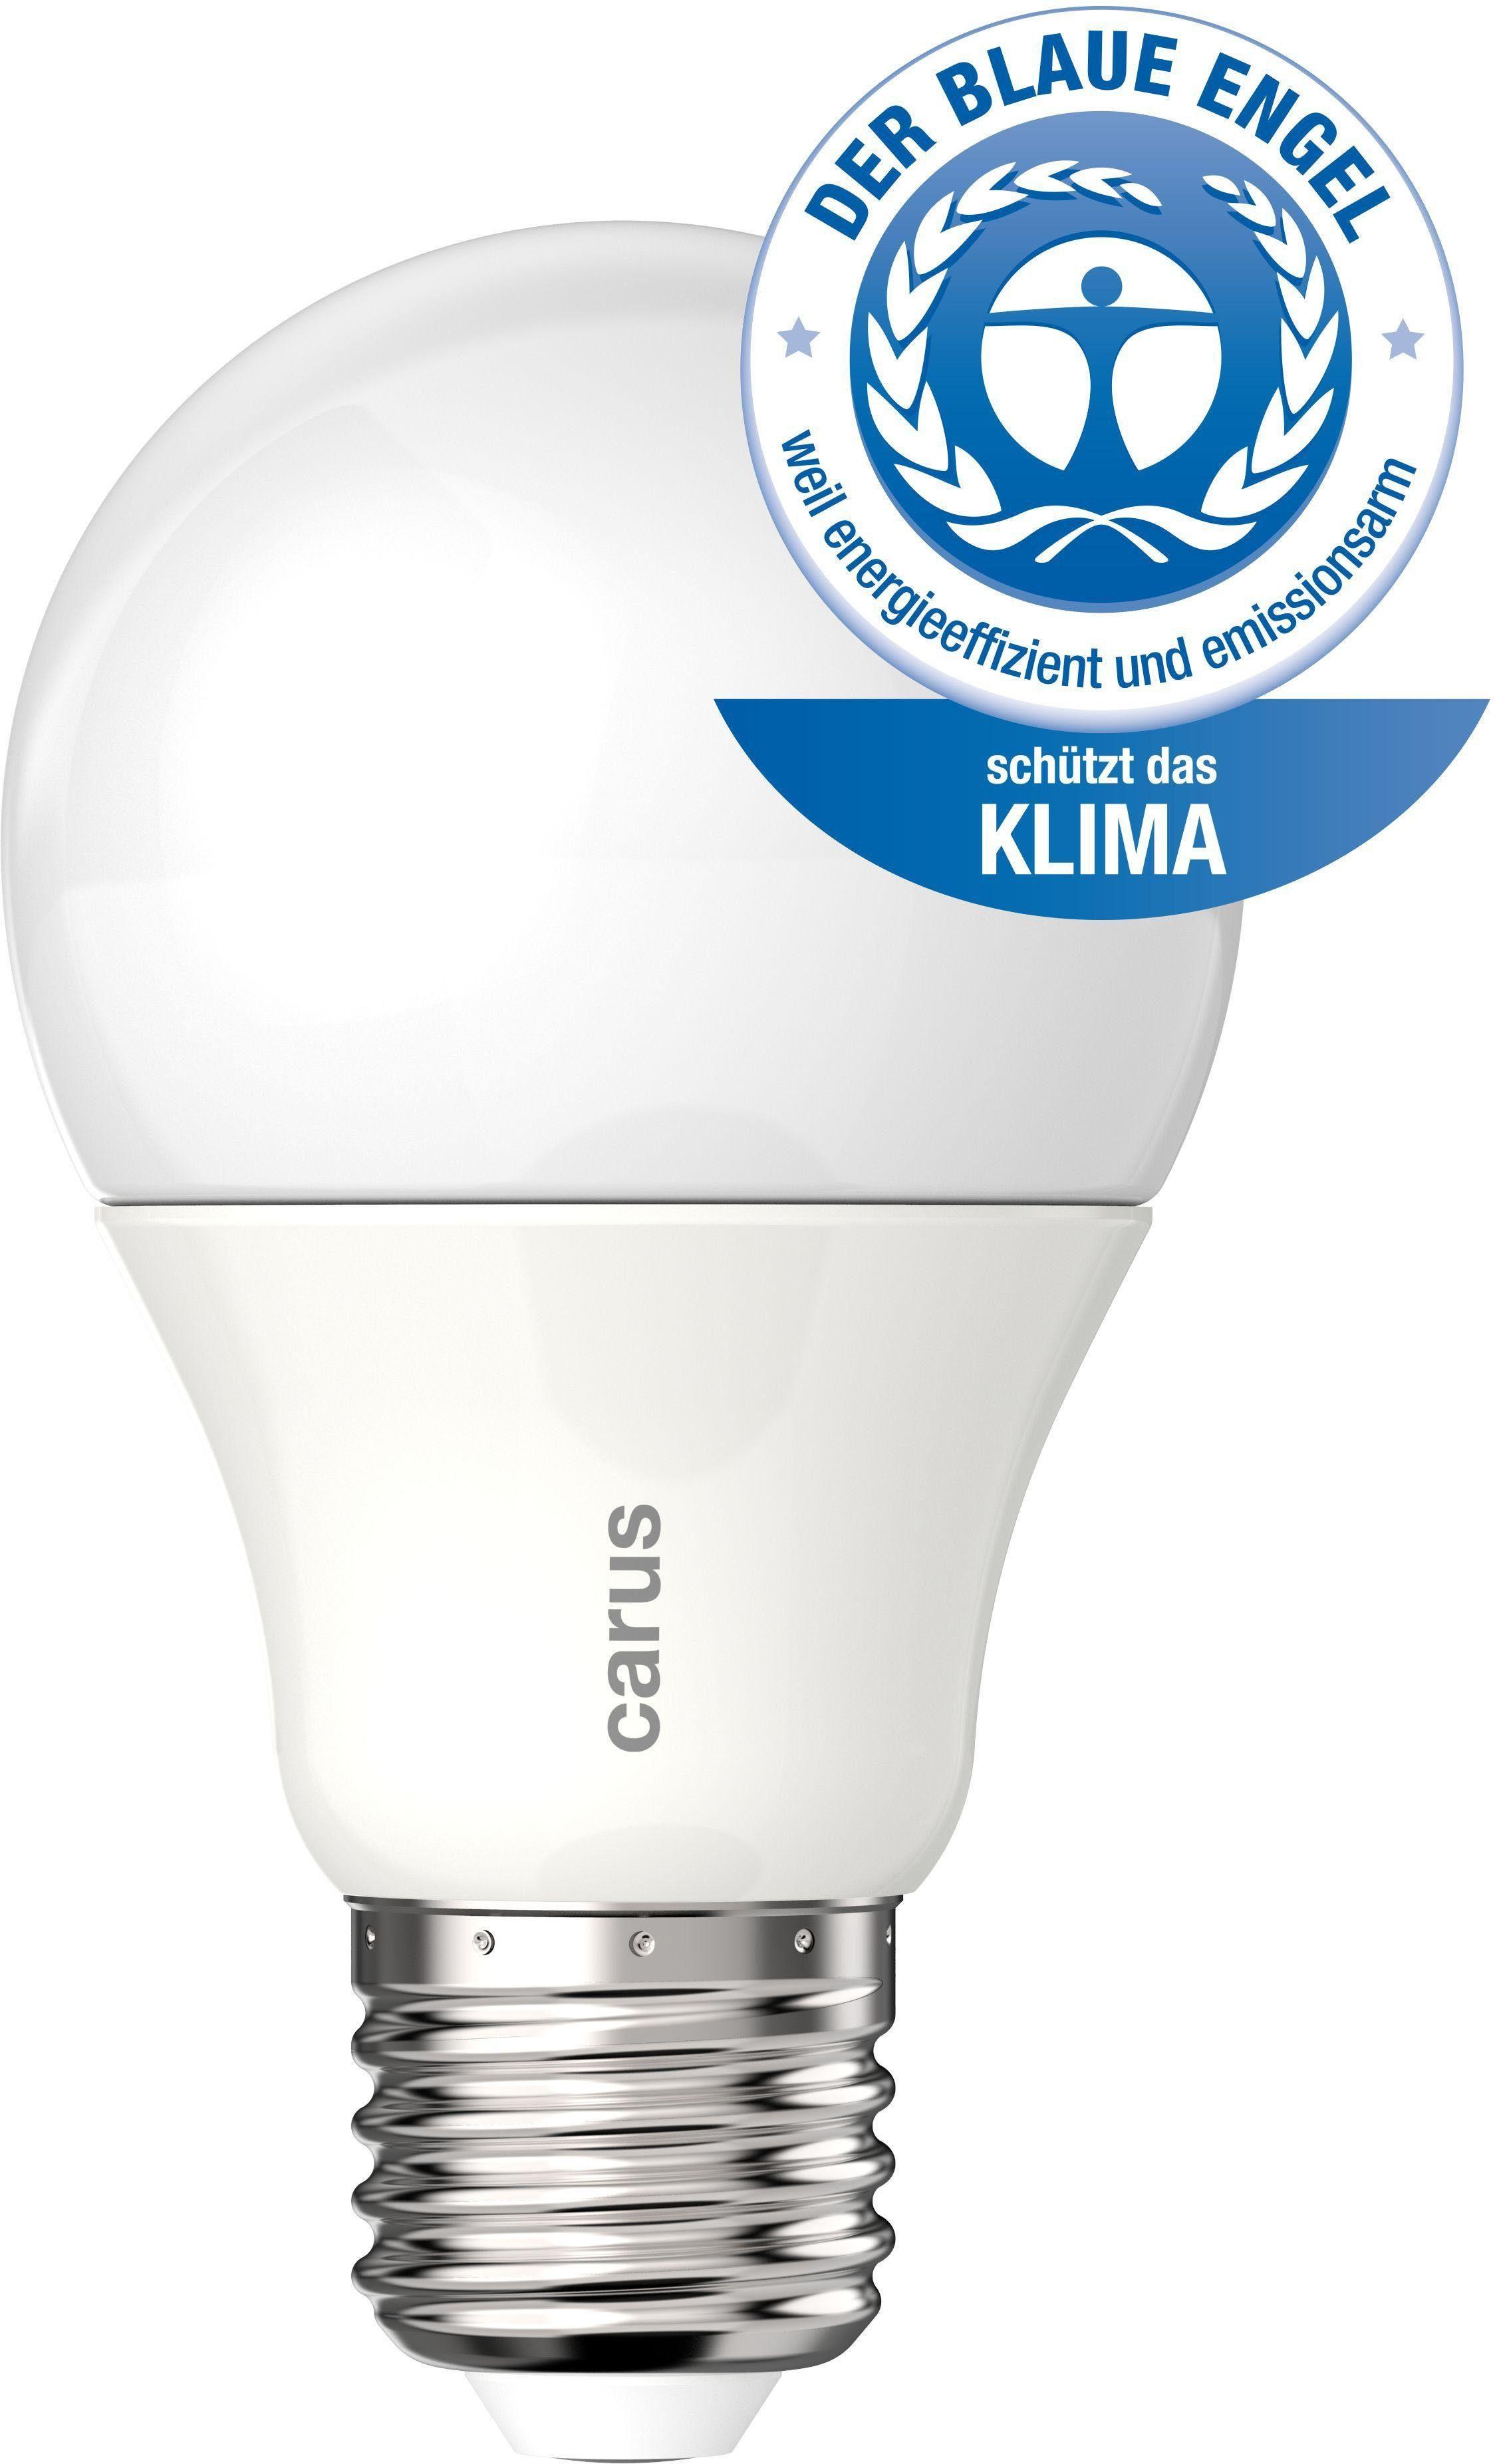 carus »Blauer Engel« LED-Leuchtmittel, E27, 2 Stück, Warmweiß